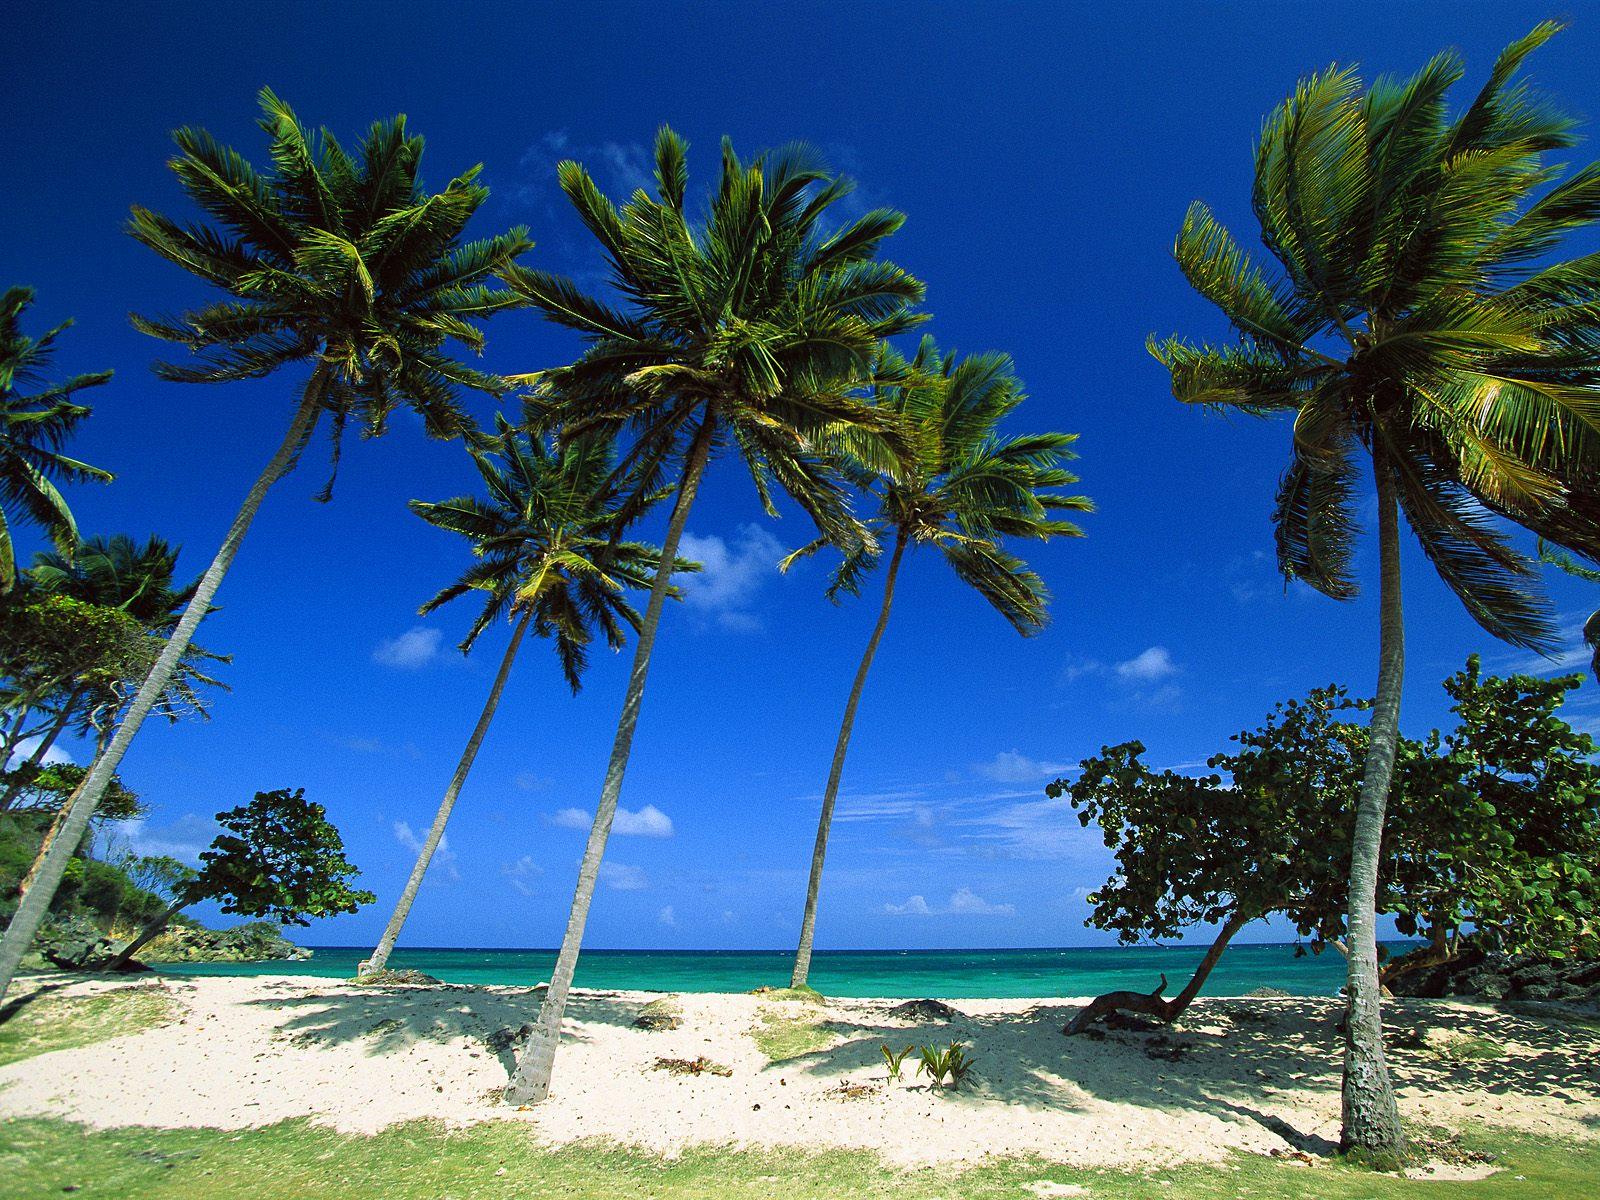 http://2.bp.blogspot.com/-1cEPUnv_Zfw/TwAmrY9wQ3I/AAAAAAAAAc4/JzzS_cj5tvA/s1600/Beach+Bacardi+Beach+Cayo+Levantado+Dominican+Republic.jpg